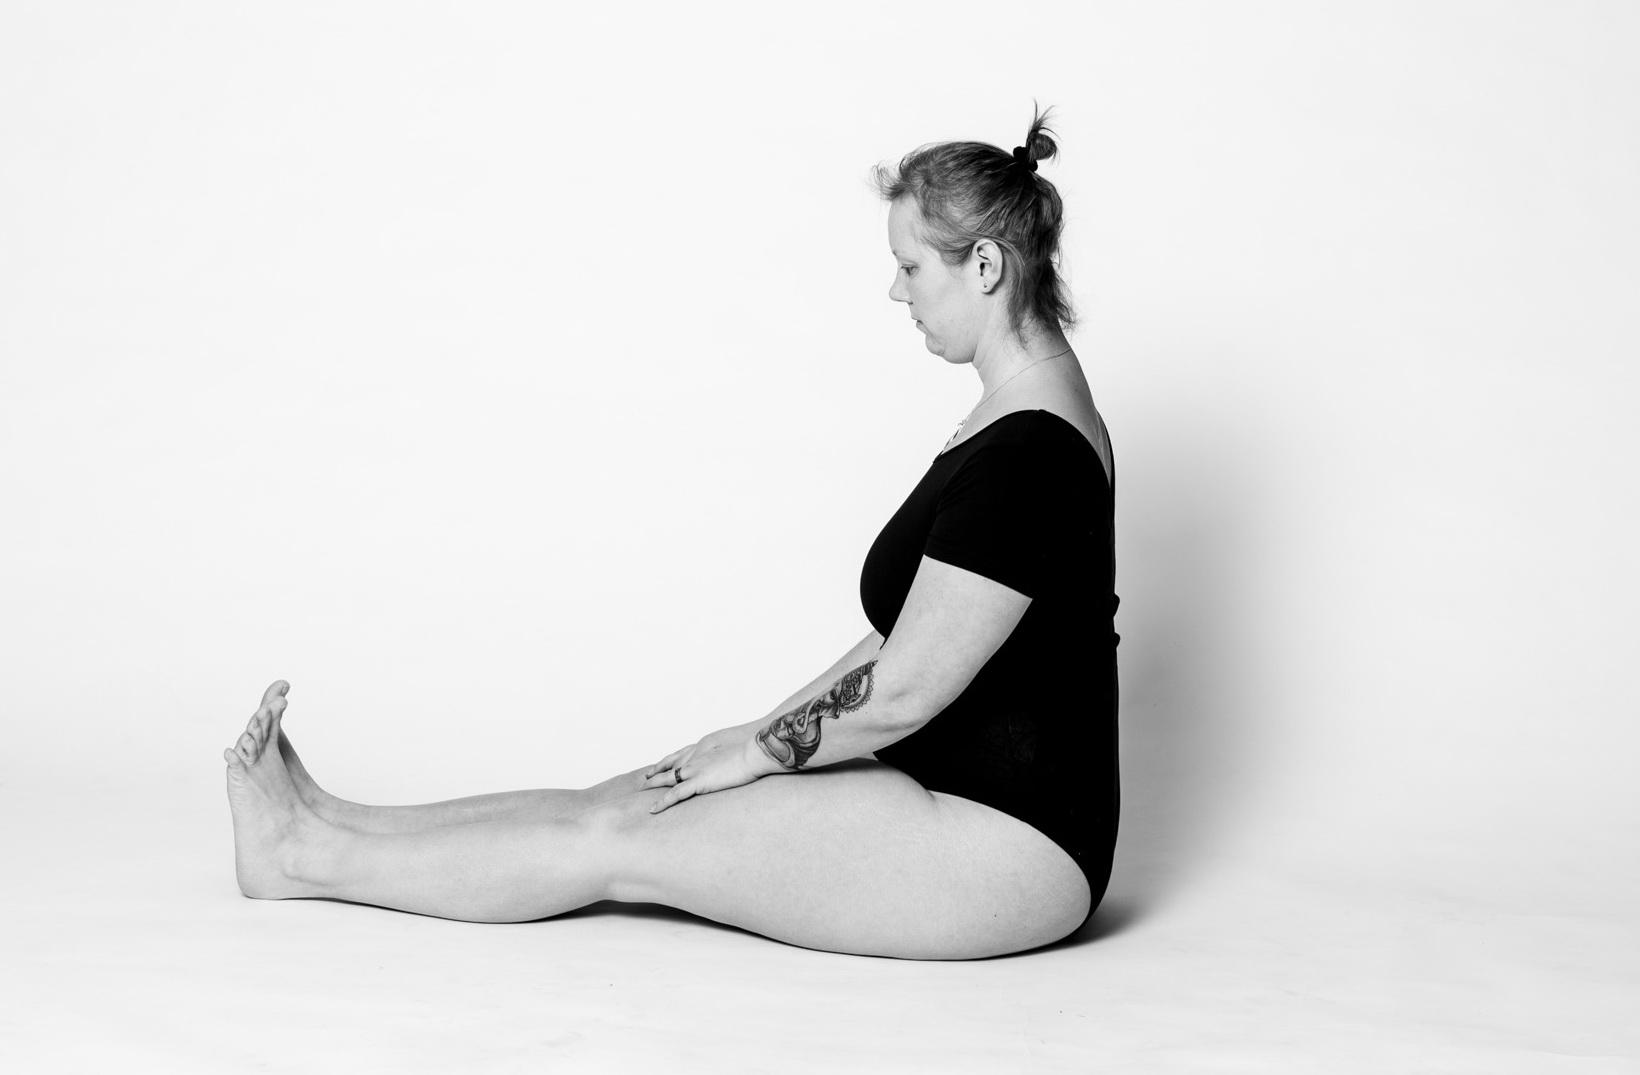 Langsitz Stockhaltung Yoga Asana Christine Raab Dandasana schwarz weiß Body